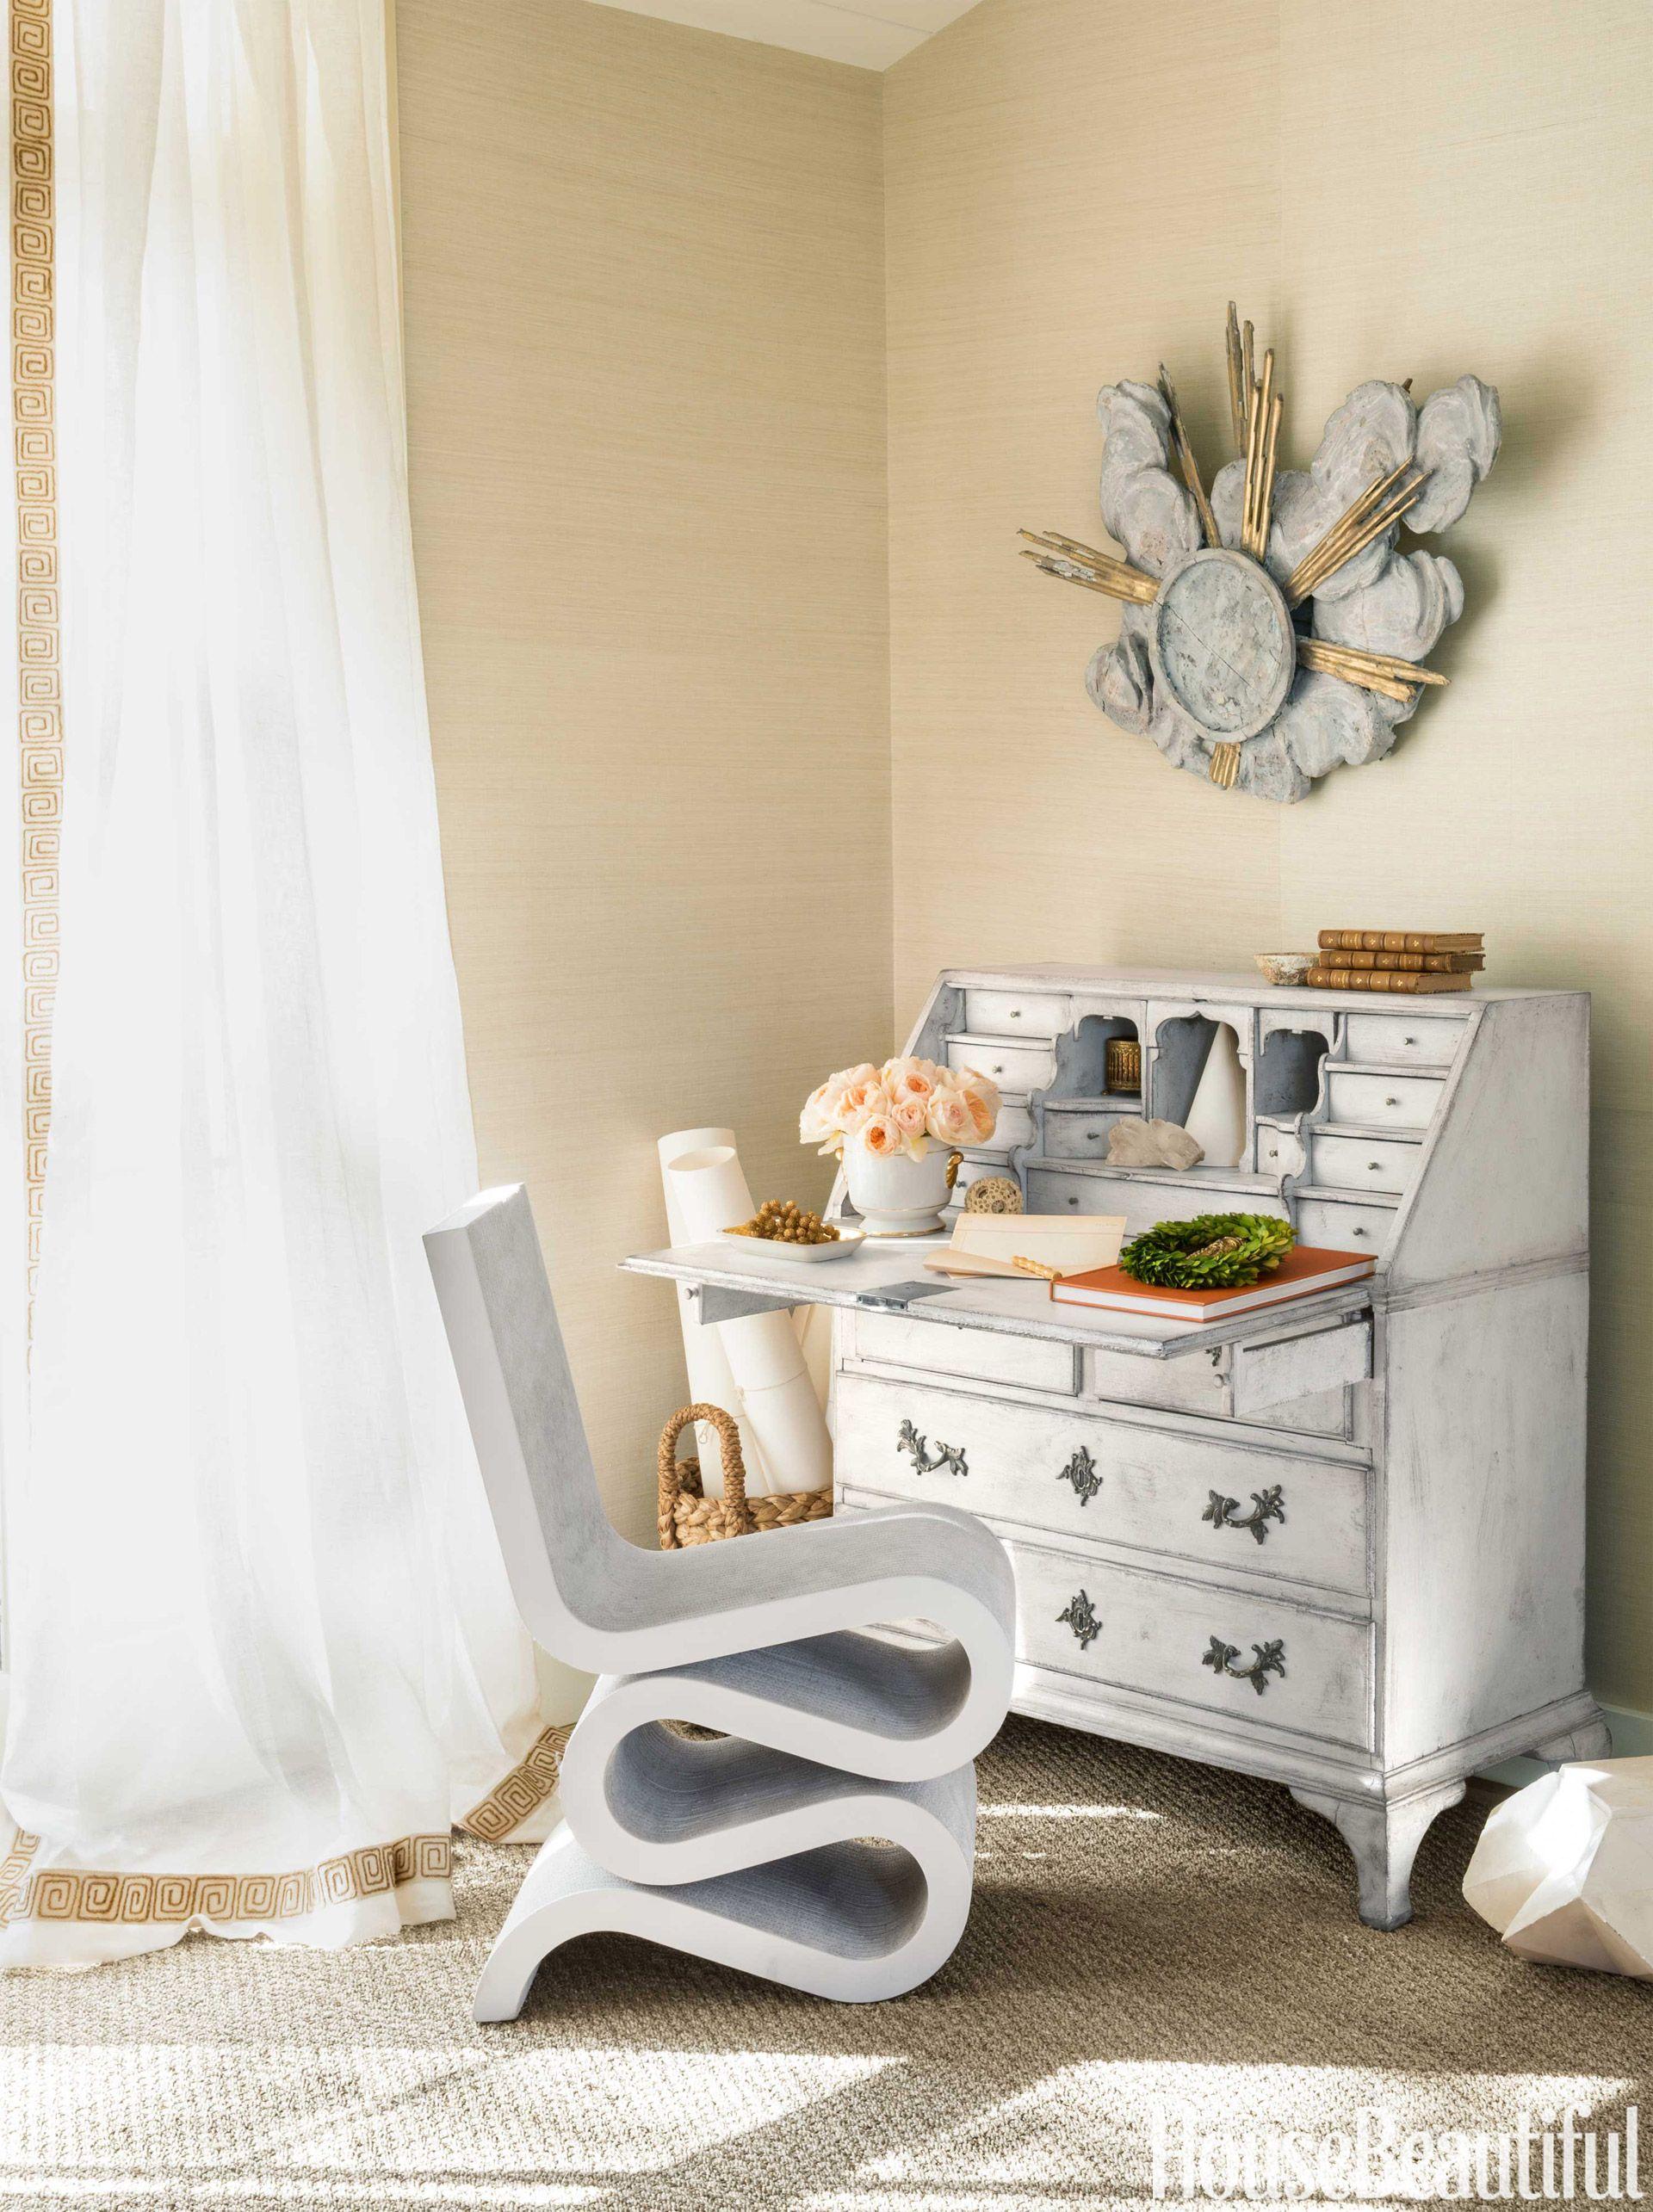 Stylish Home Organization Ideas - High Design Ways to Organize Your Home